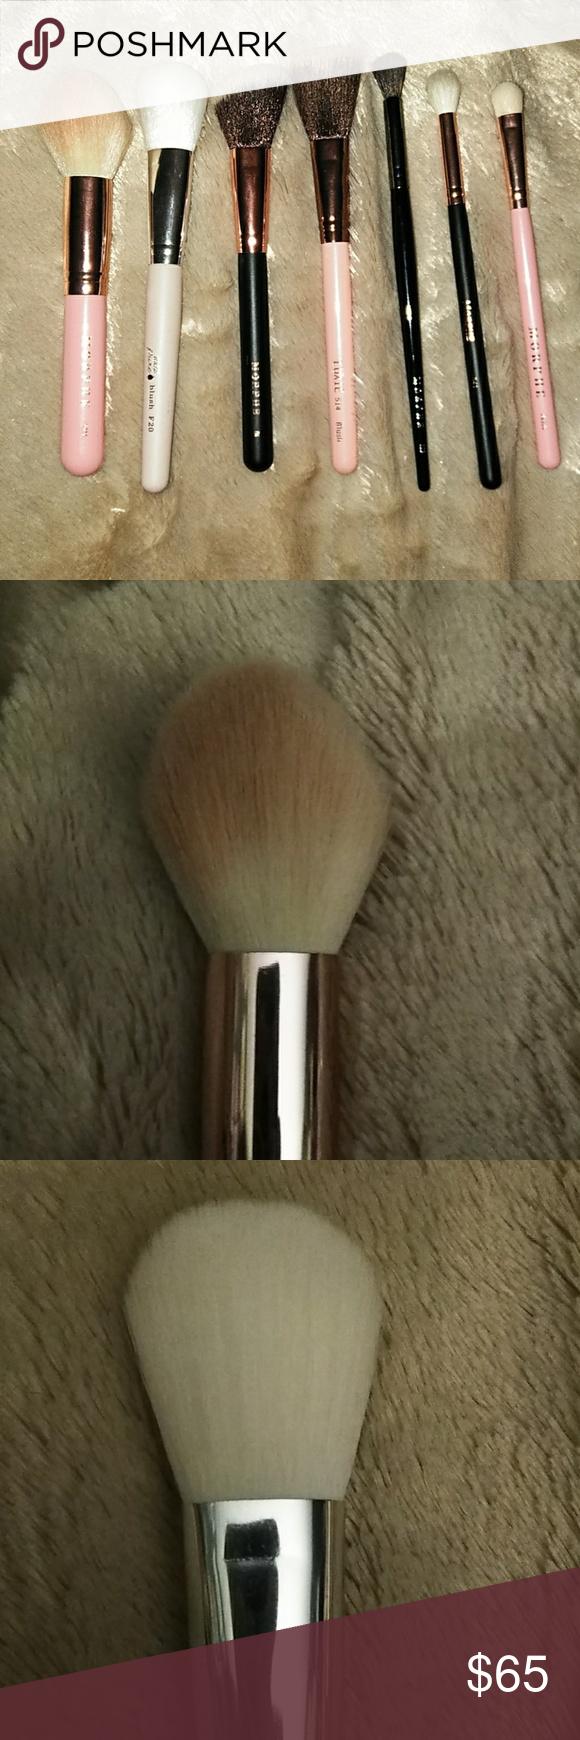 Full Face & Eye Brush Set Luxie Morphe 7pc NWT Eye